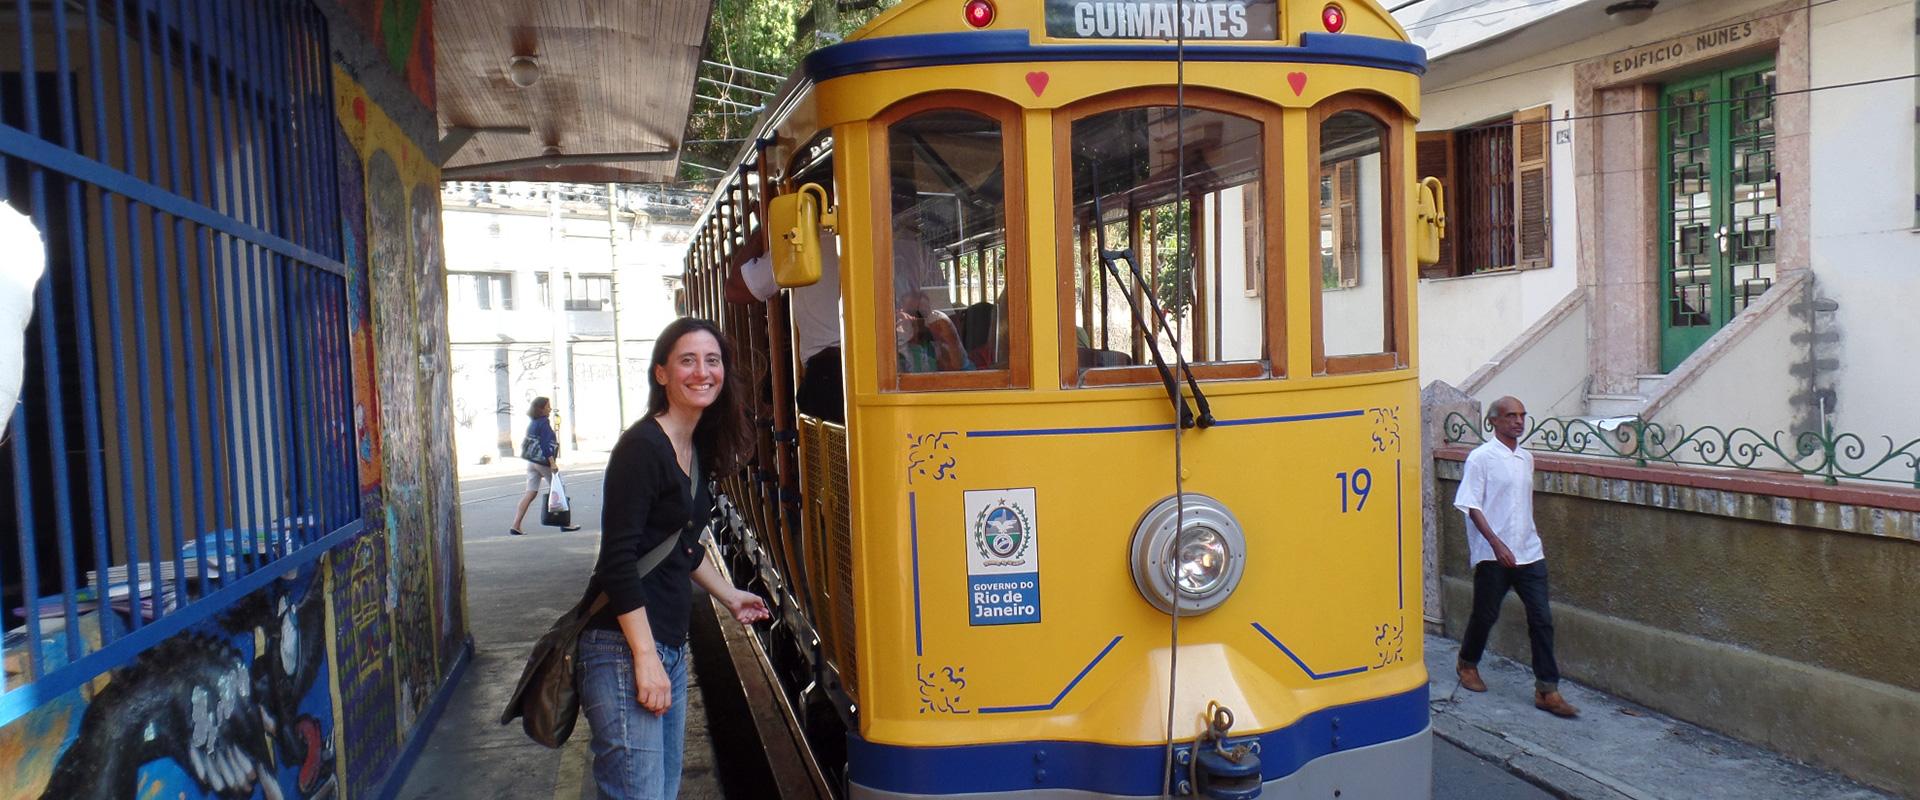 Spanish student learning Portuguese at Santa teresa in Rio de Janeiro.